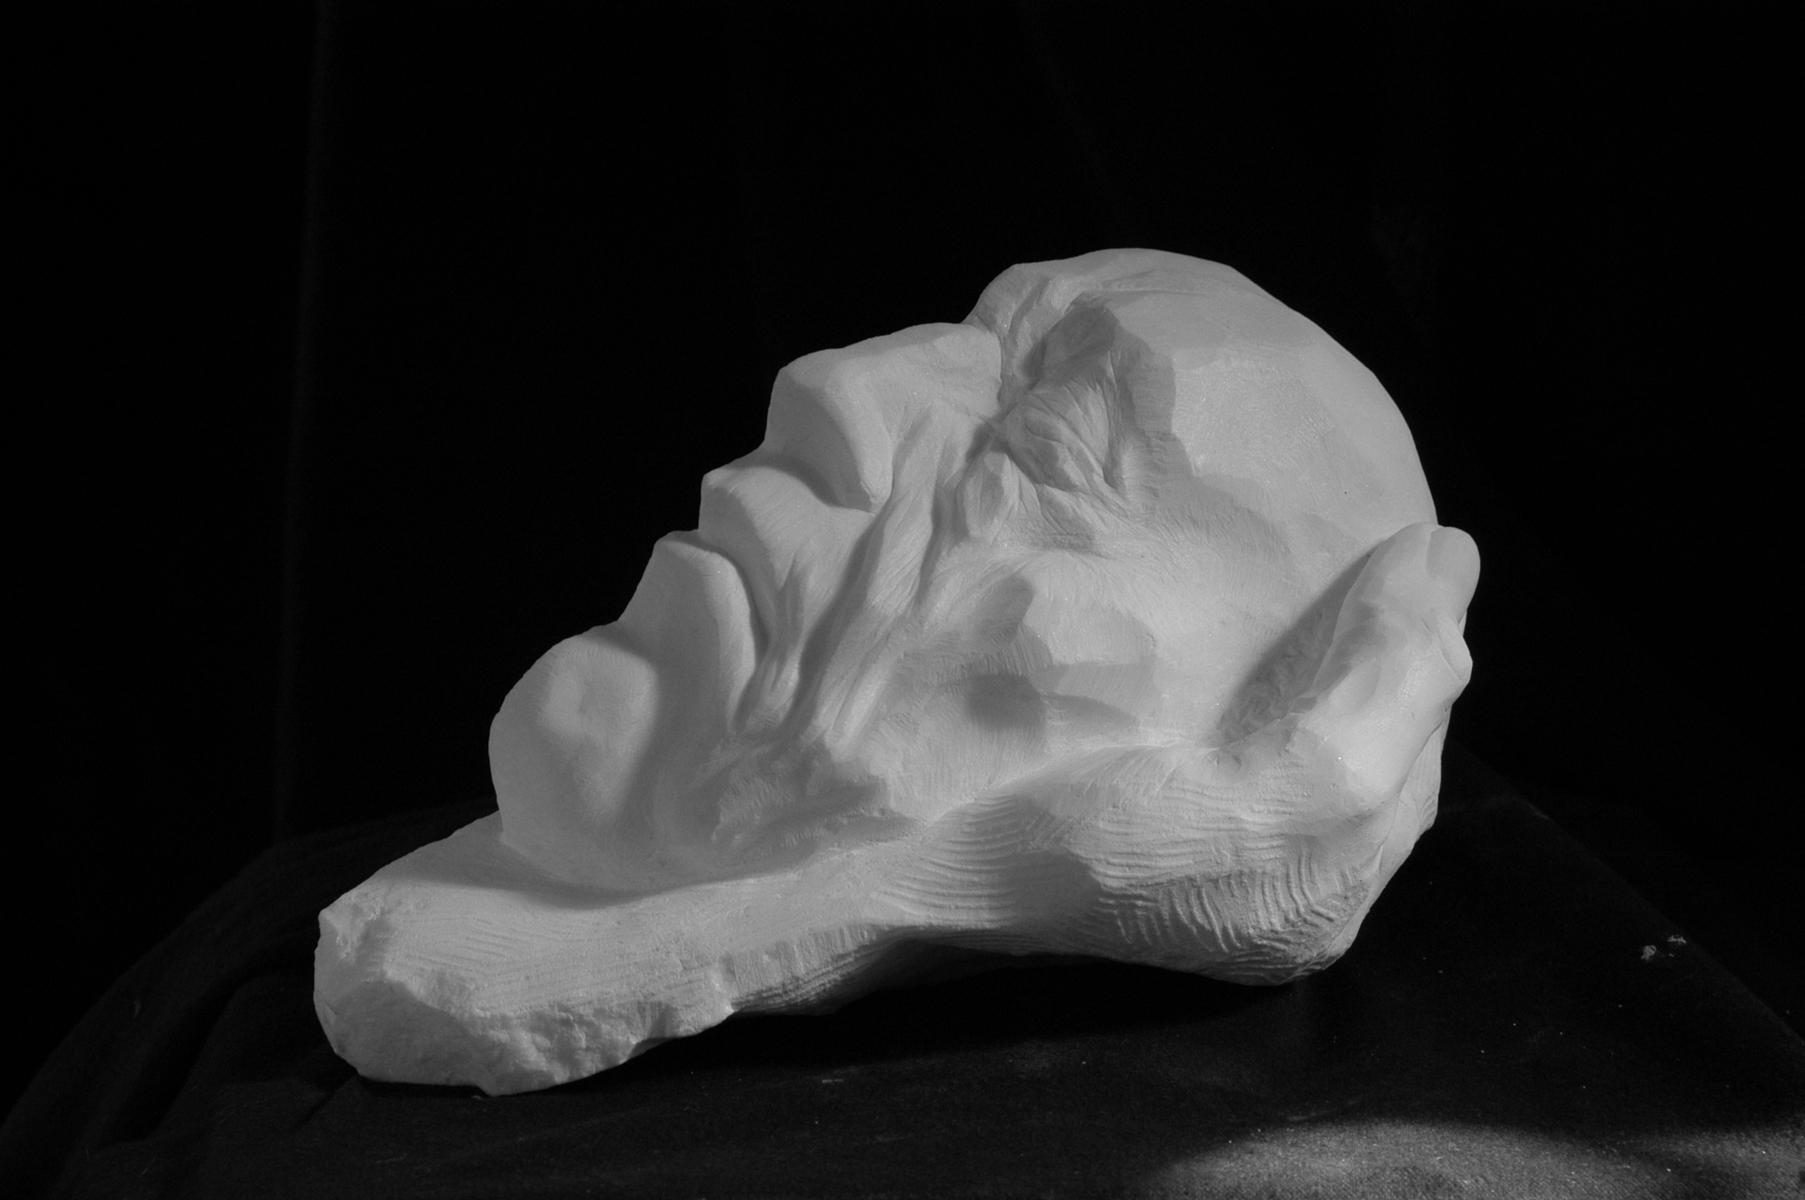 Elena-Mutinelli-20-etra-studio-tommasi